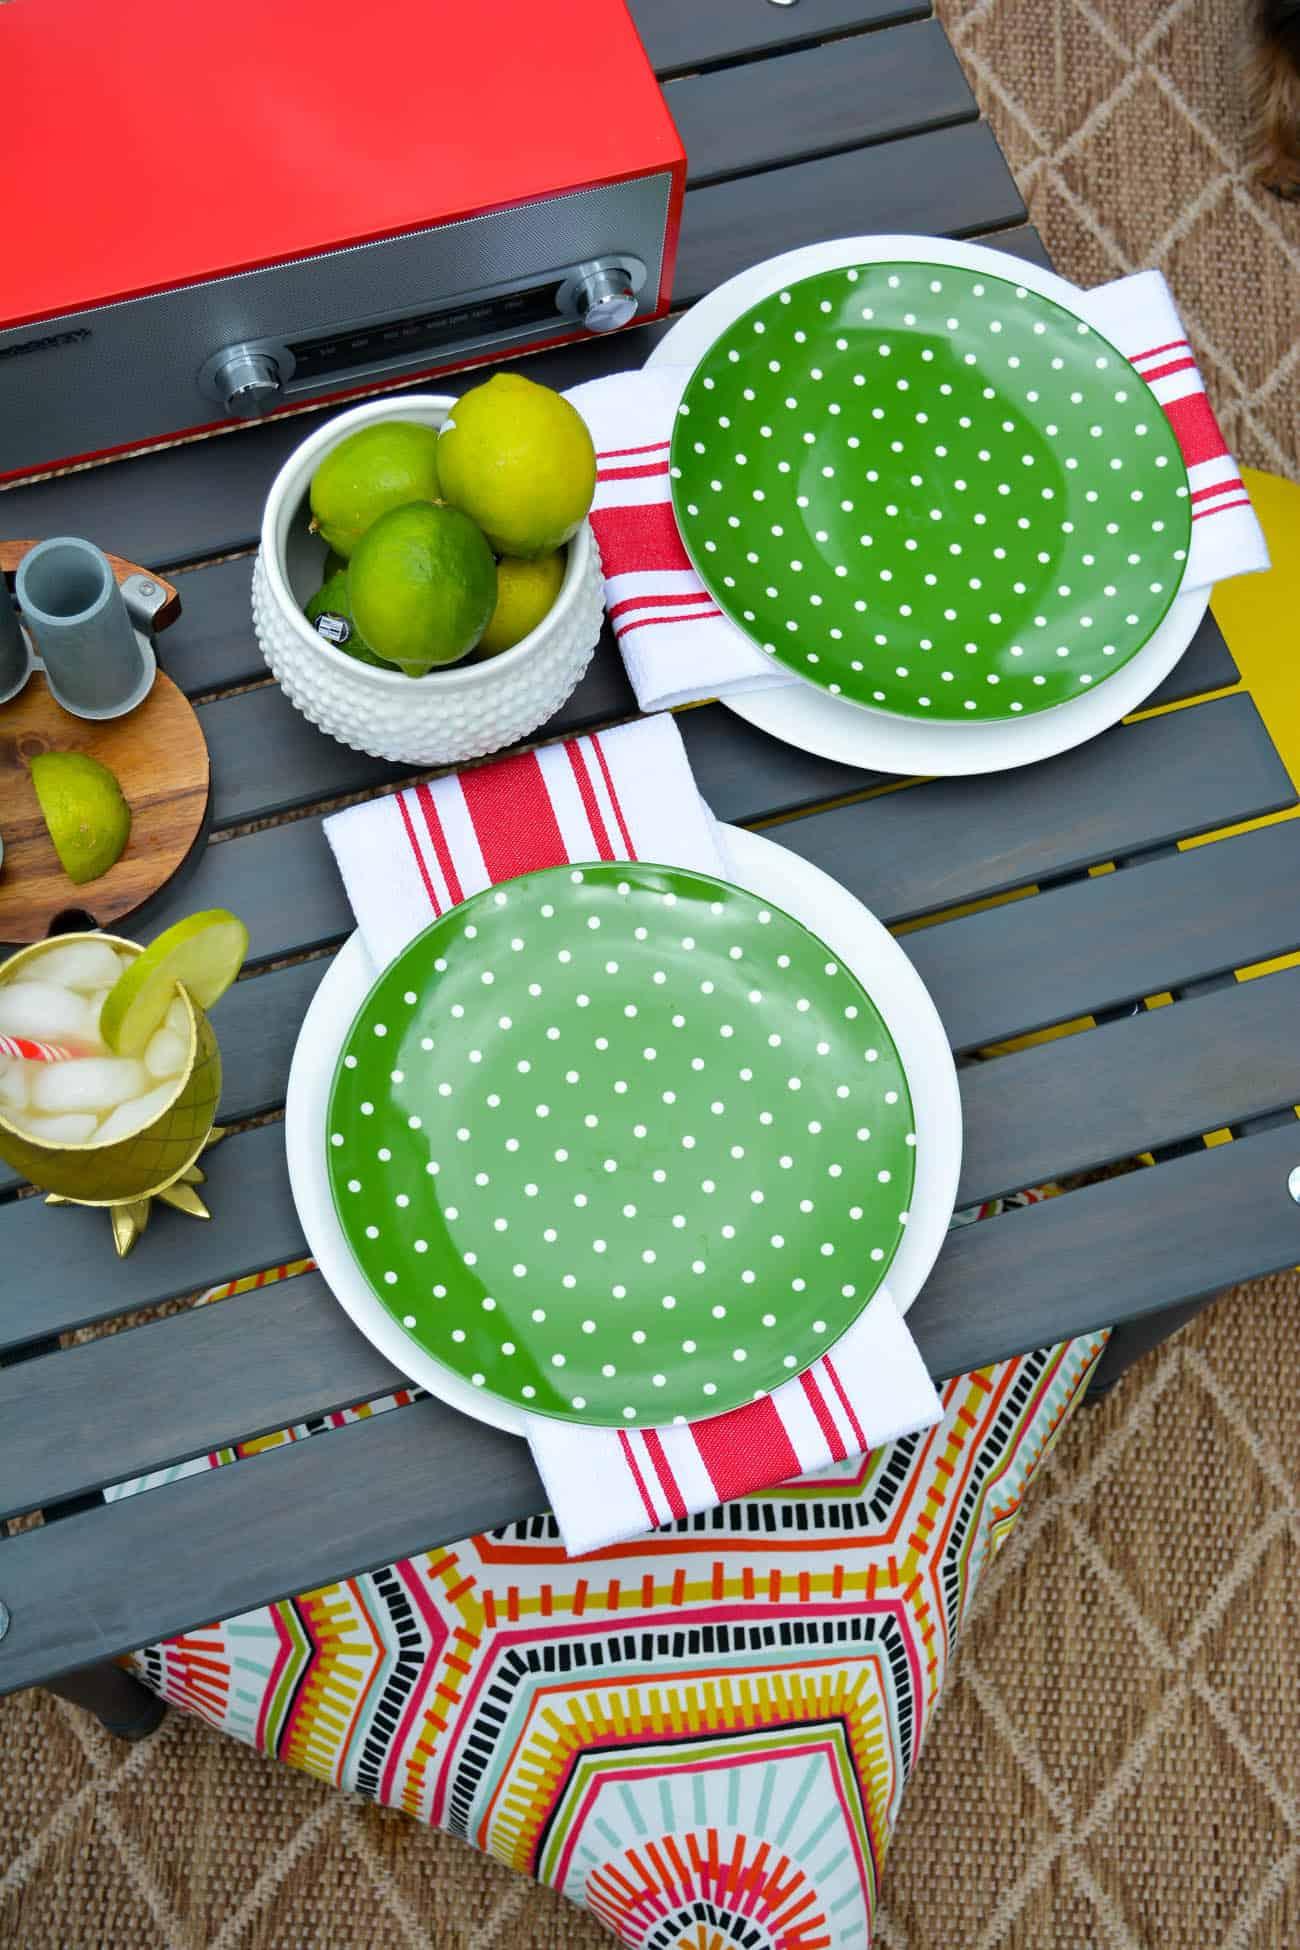 Upgrade your life with Fab, Fab.com, Kate Spade Polka Dot plates. home decor, outdoor entertaining